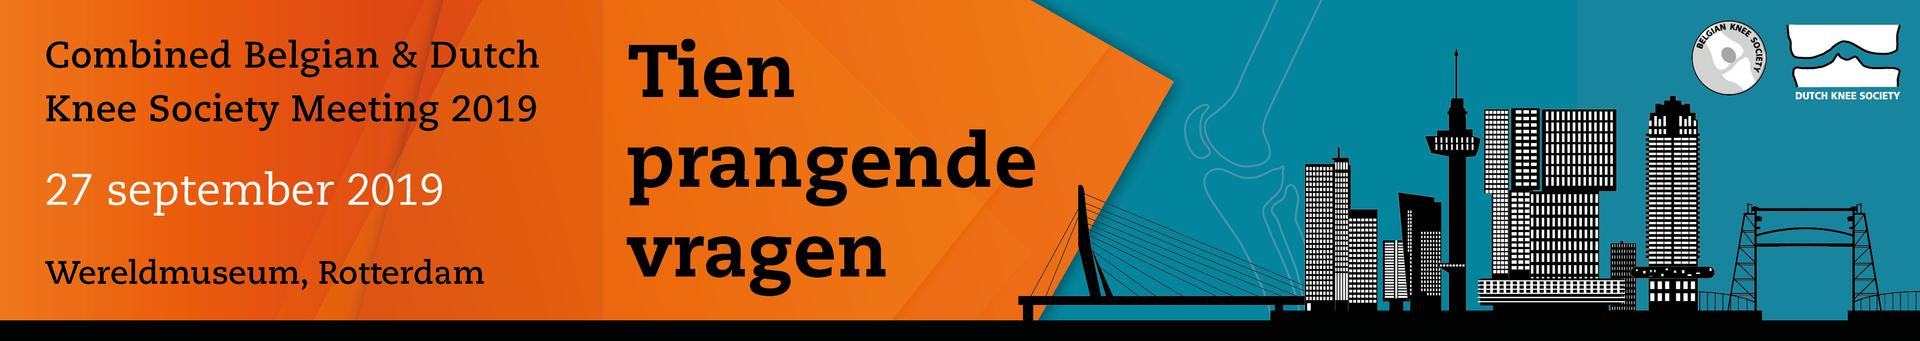 Combined Belgian & Dutch Knee Society Meeting 2019